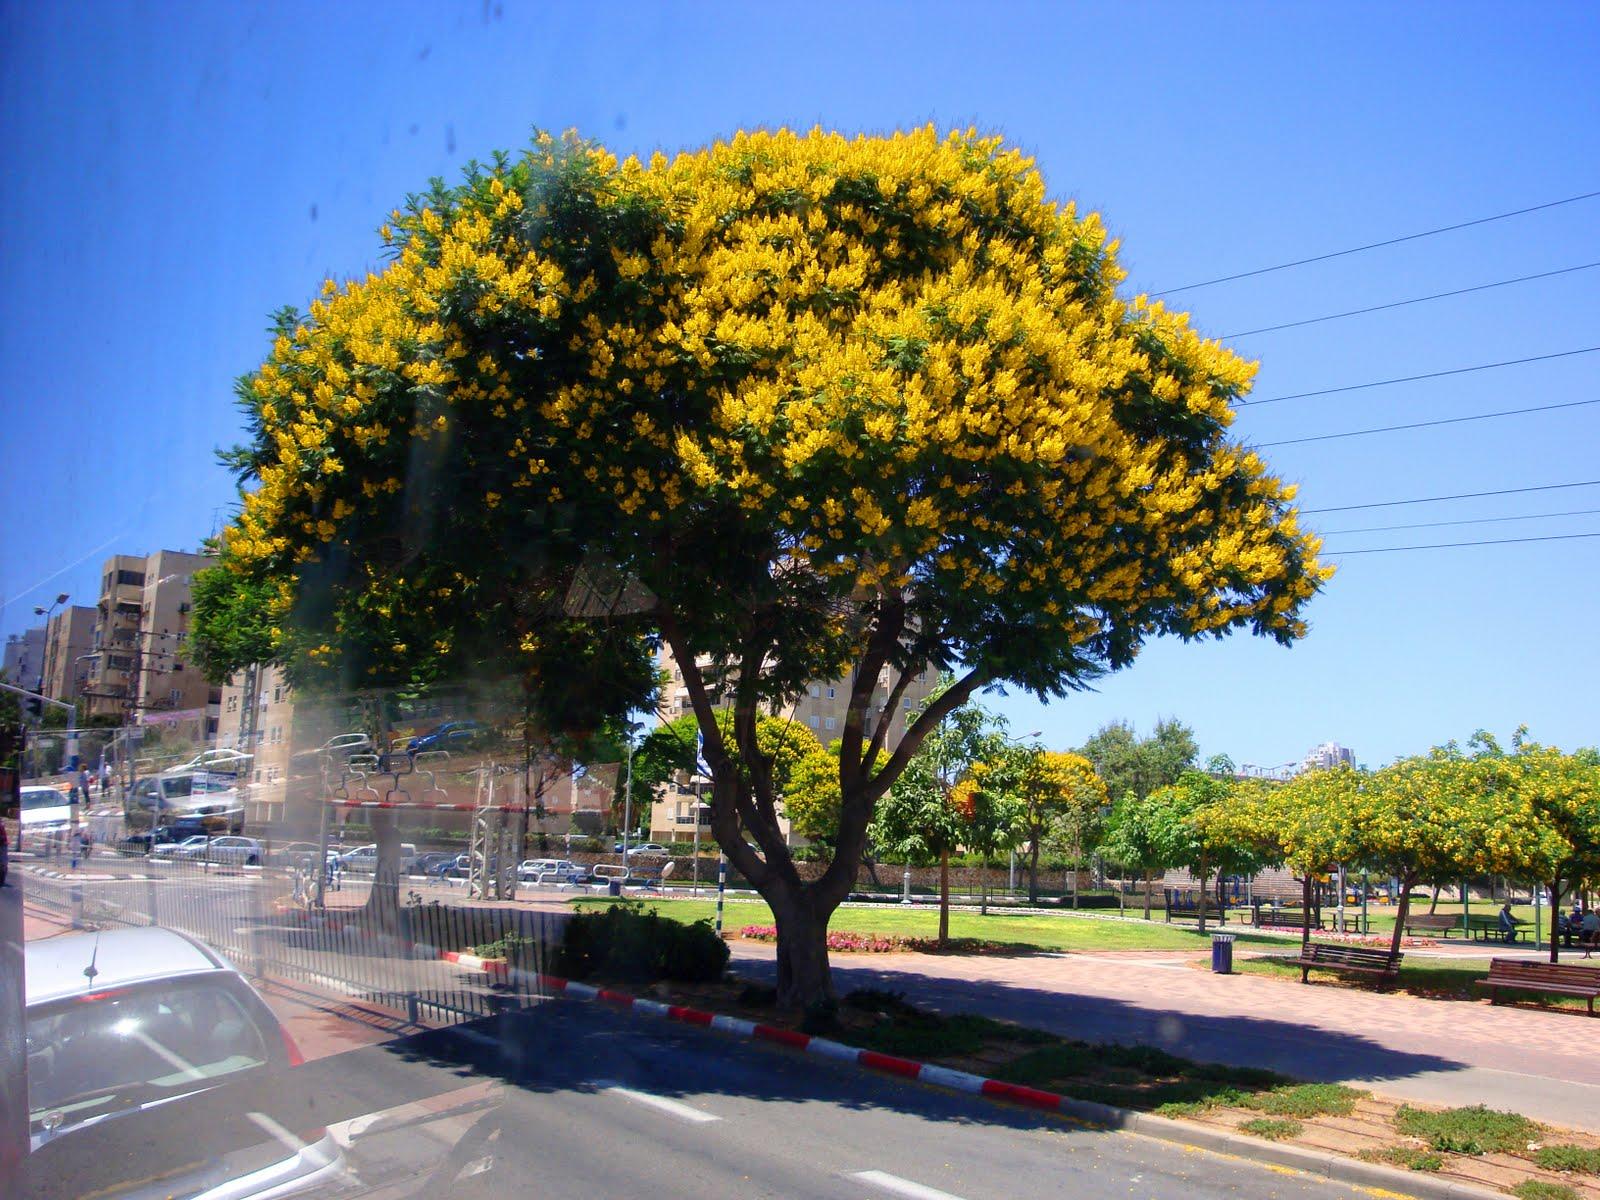 Там сейчас цветет желтая шита